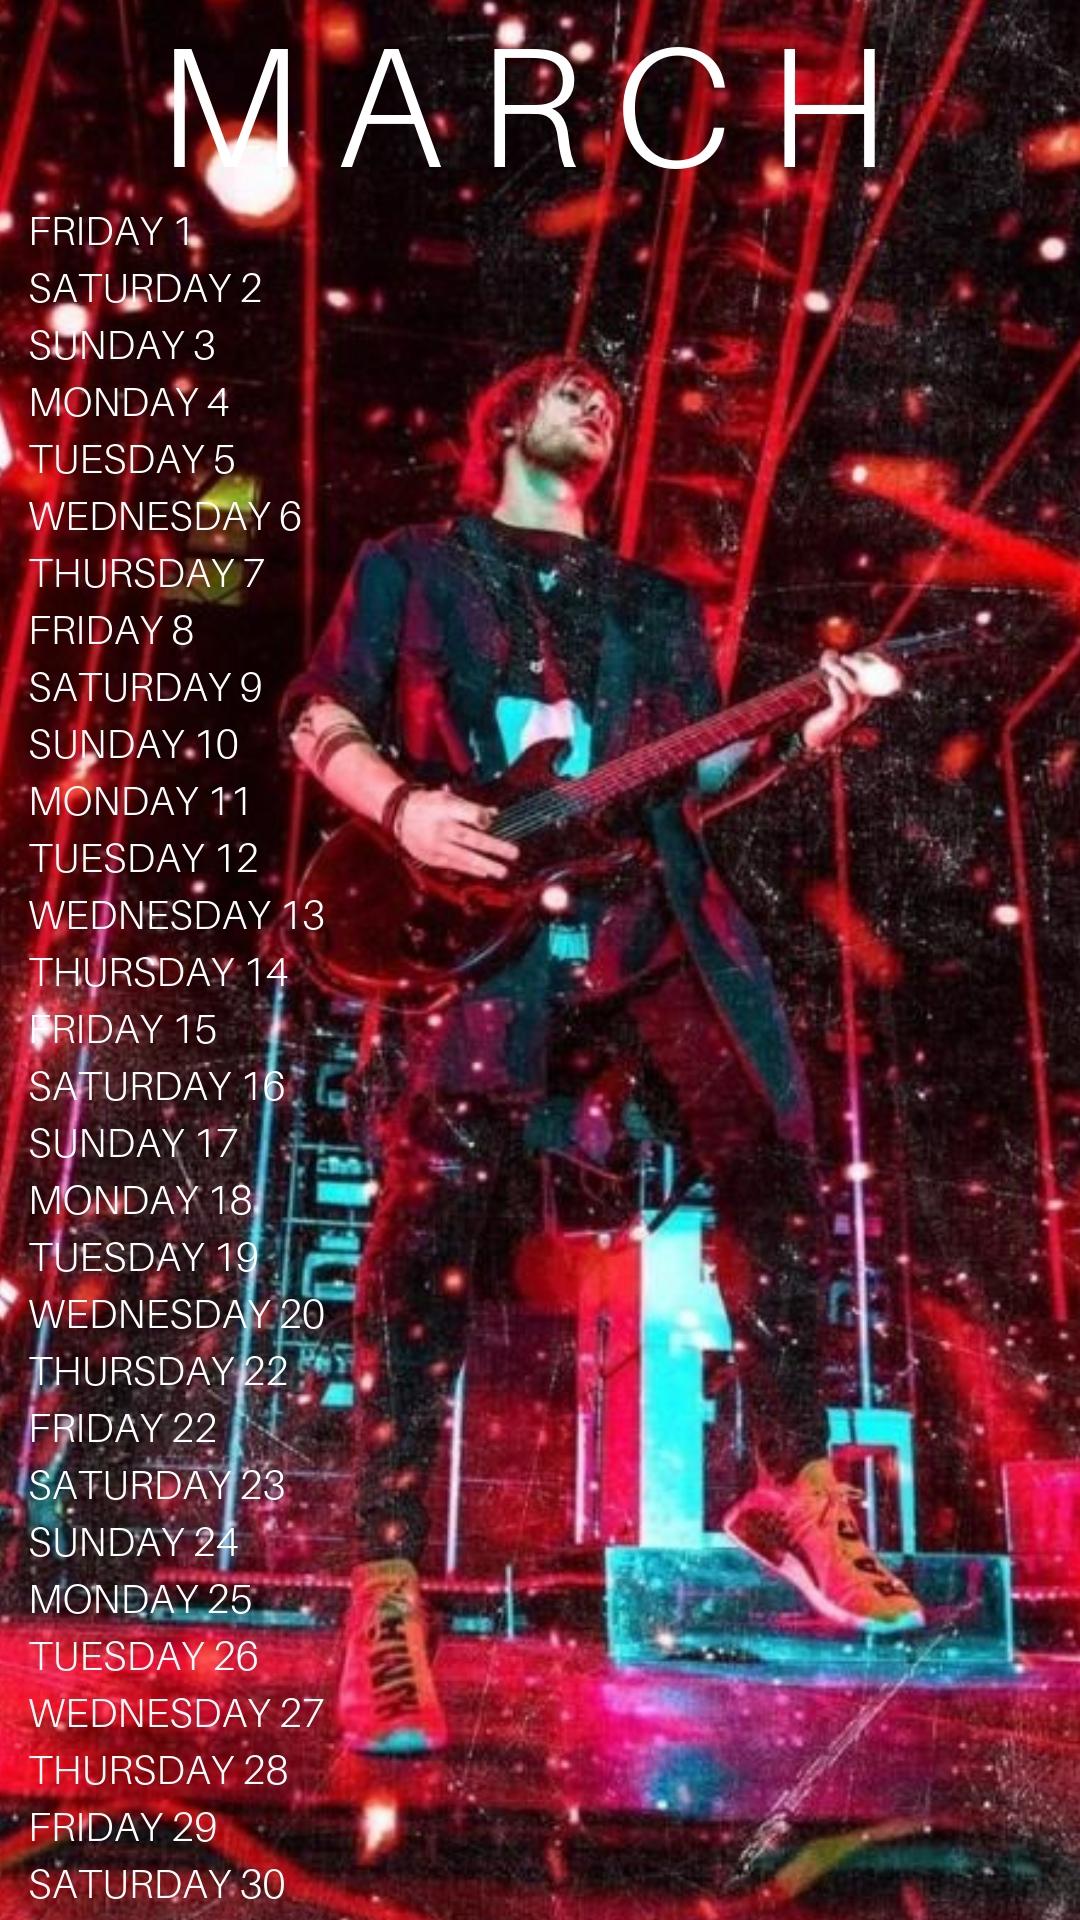 5Sos Calendars | Tumblr Calendar 2019 5Sos